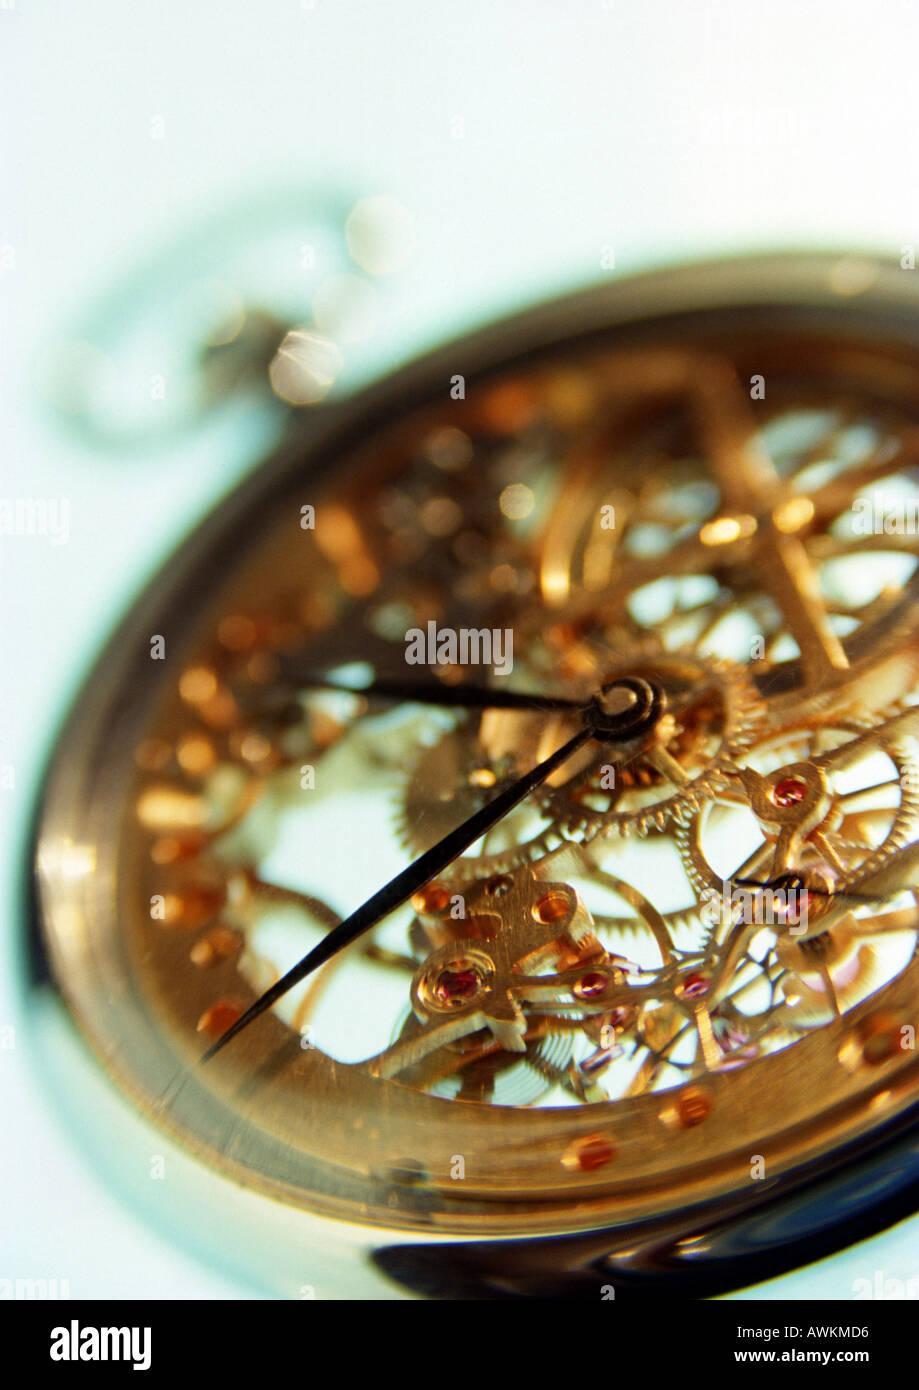 Clockwork of pocket watch, close-up - Stock Image